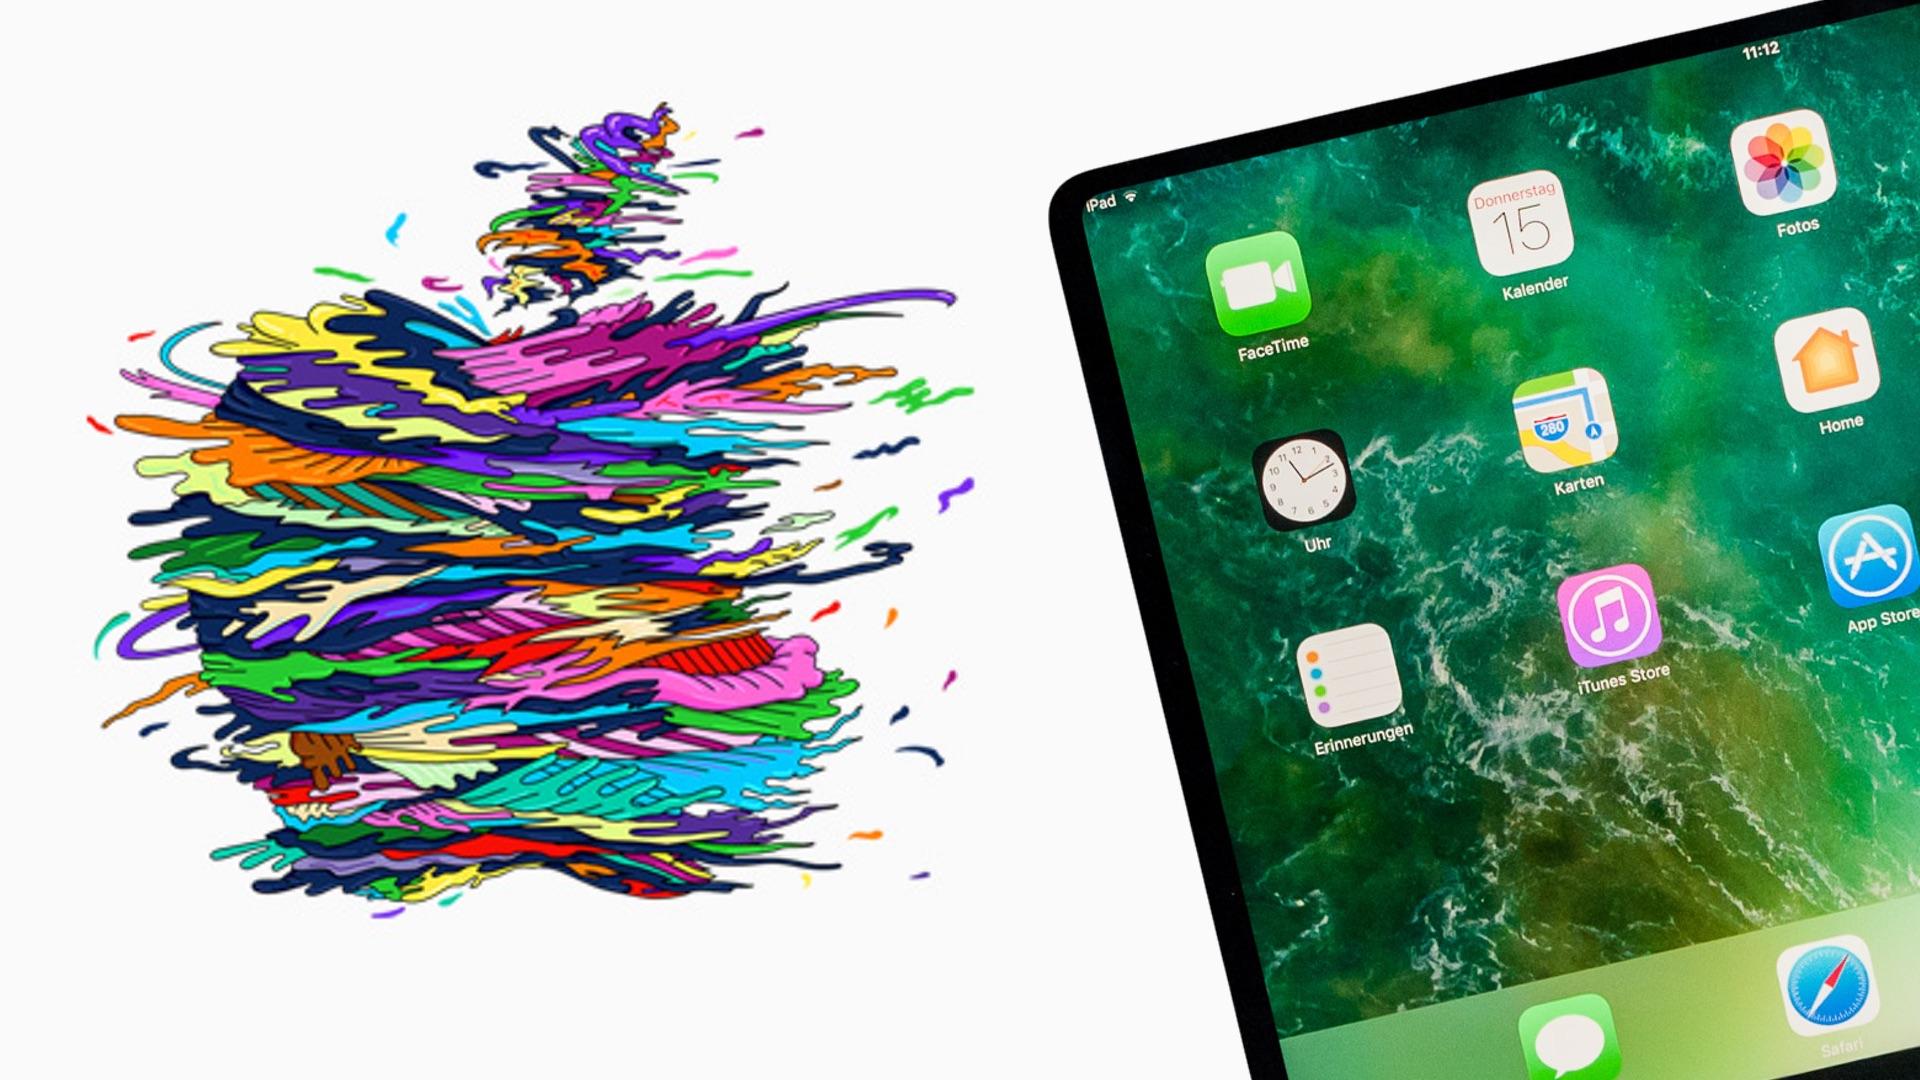 apple event was sollen das ipad pro 2018 und neue macs. Black Bedroom Furniture Sets. Home Design Ideas